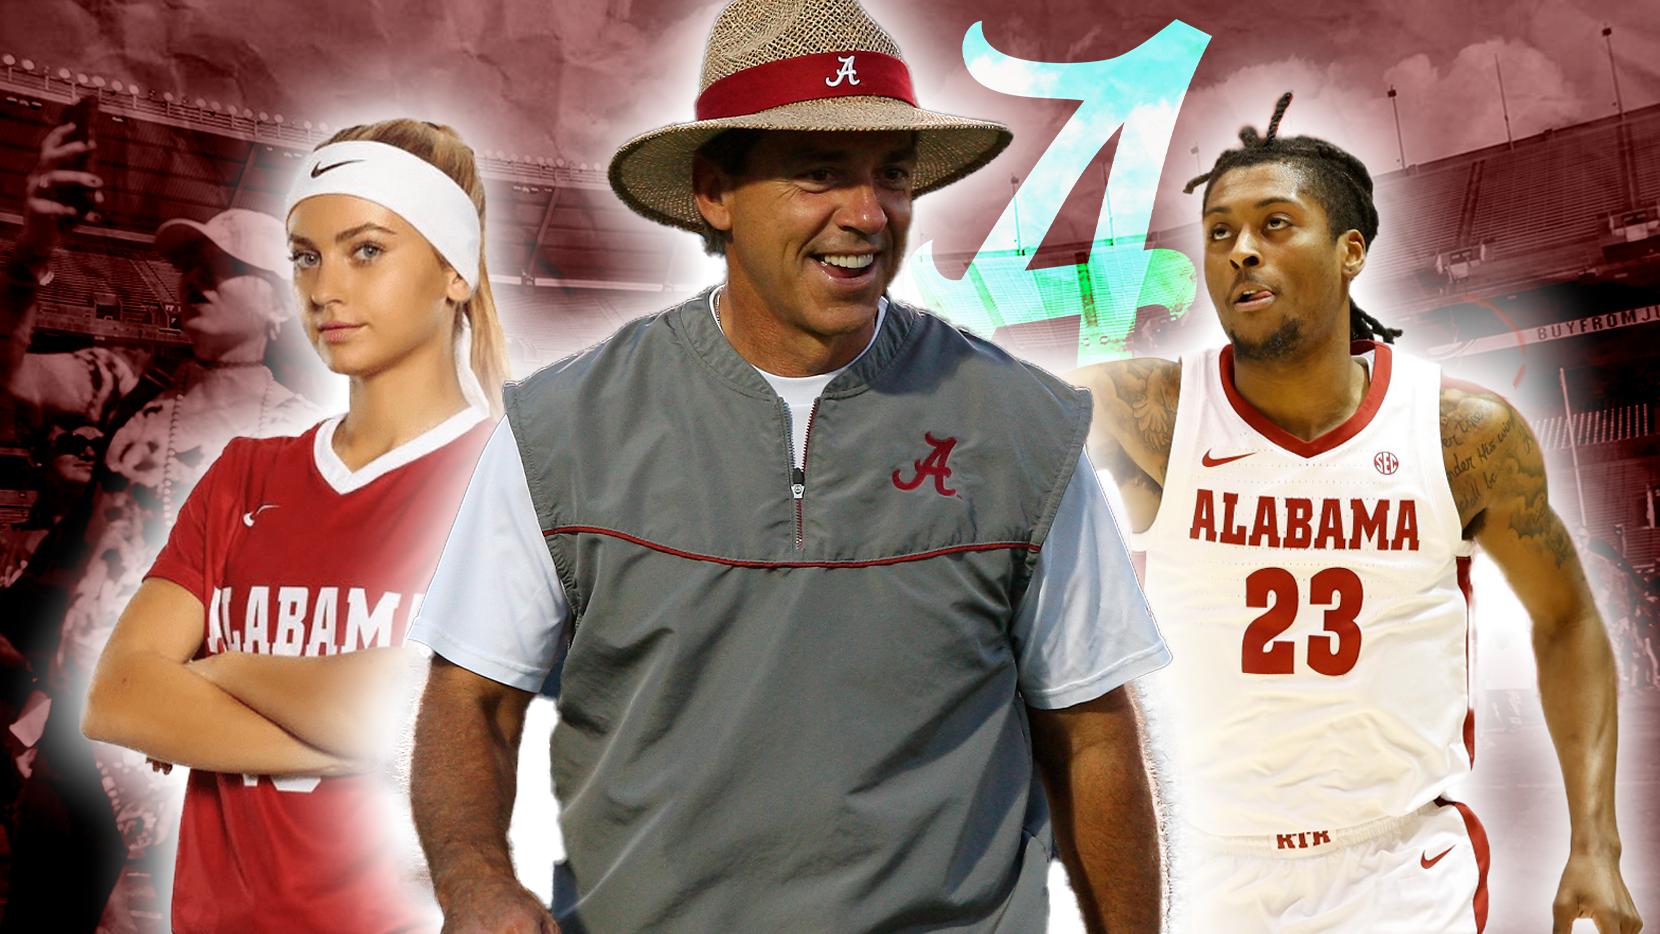 University Of Alabama Tops CBS Sports' List Of Best Athletic Program